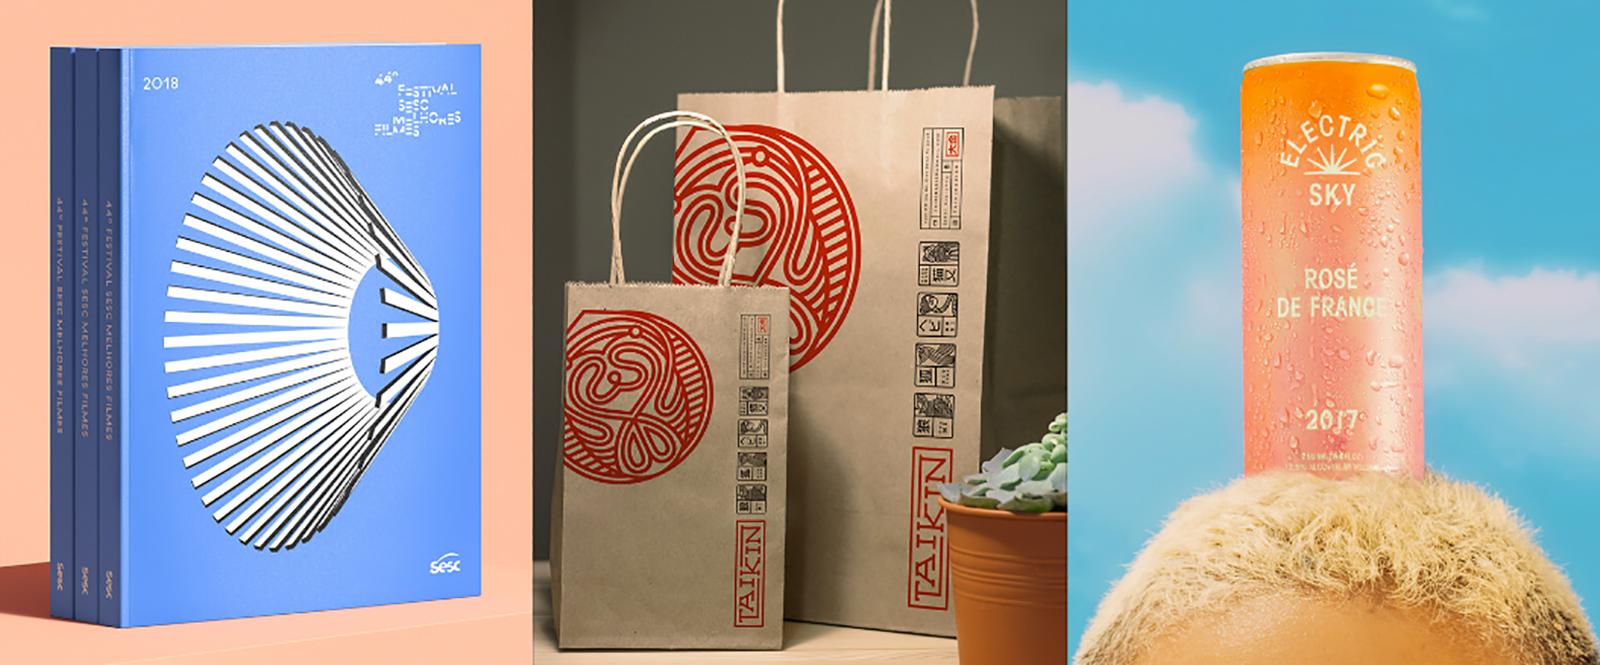 Friday Likes 271 & Taikin两款品牌包装设计欣赏-深圳VI设计